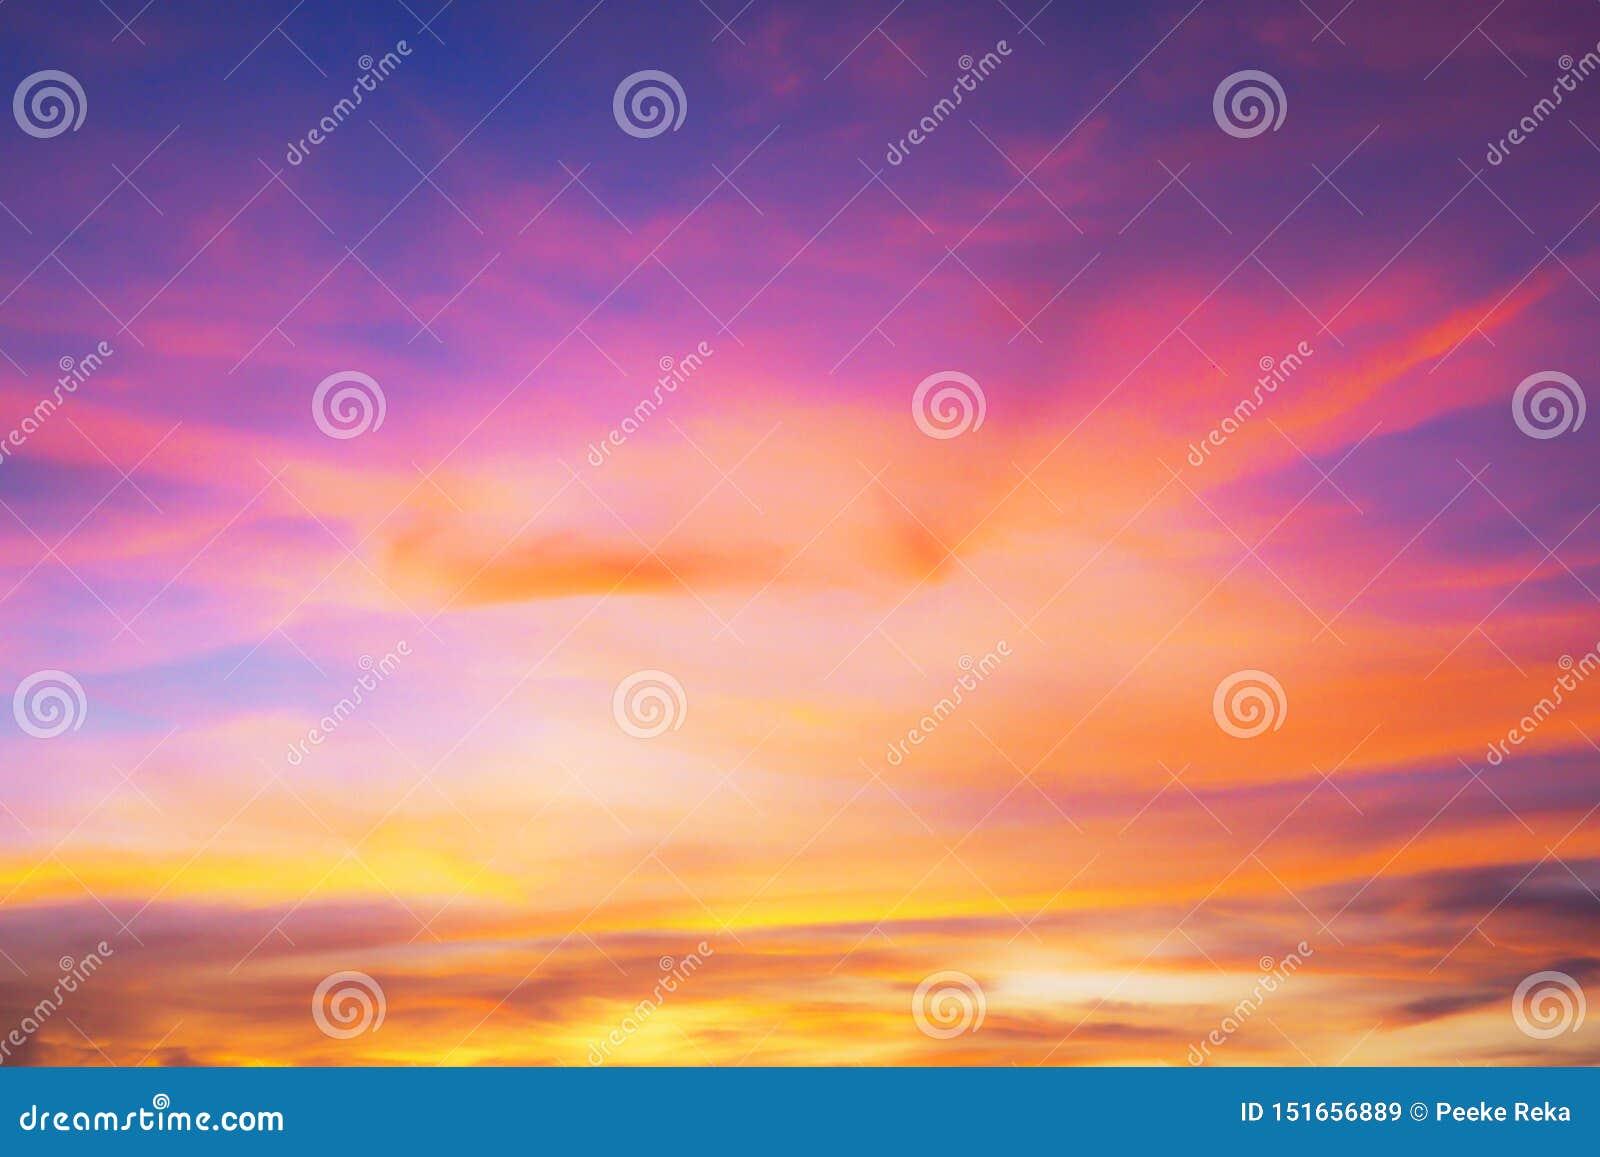 Achtergrond met purpere hemel en donker roze bij zonsondergang